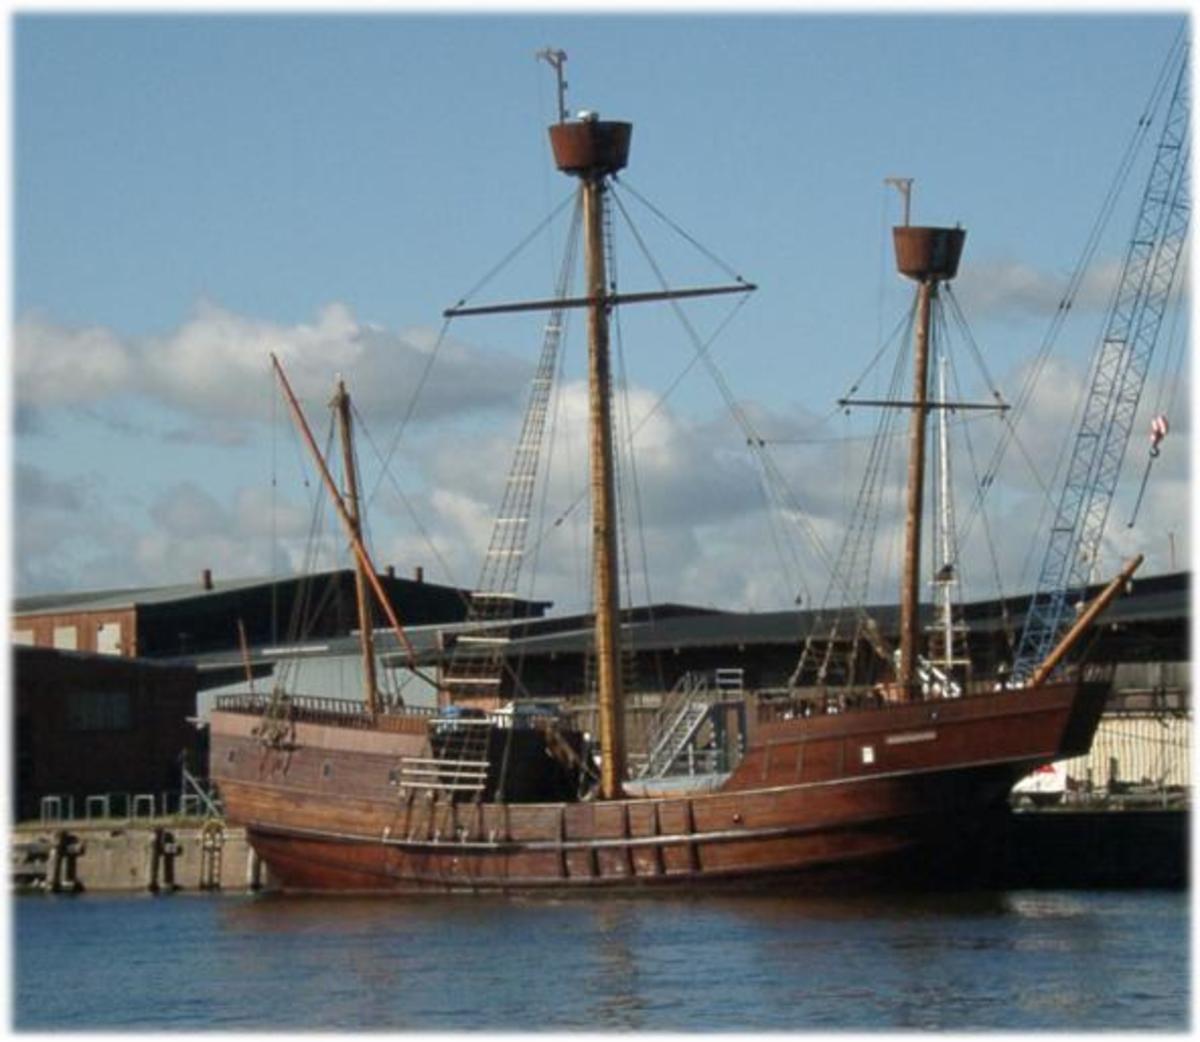 Did Templar treasure sail away on similar ship's to this?